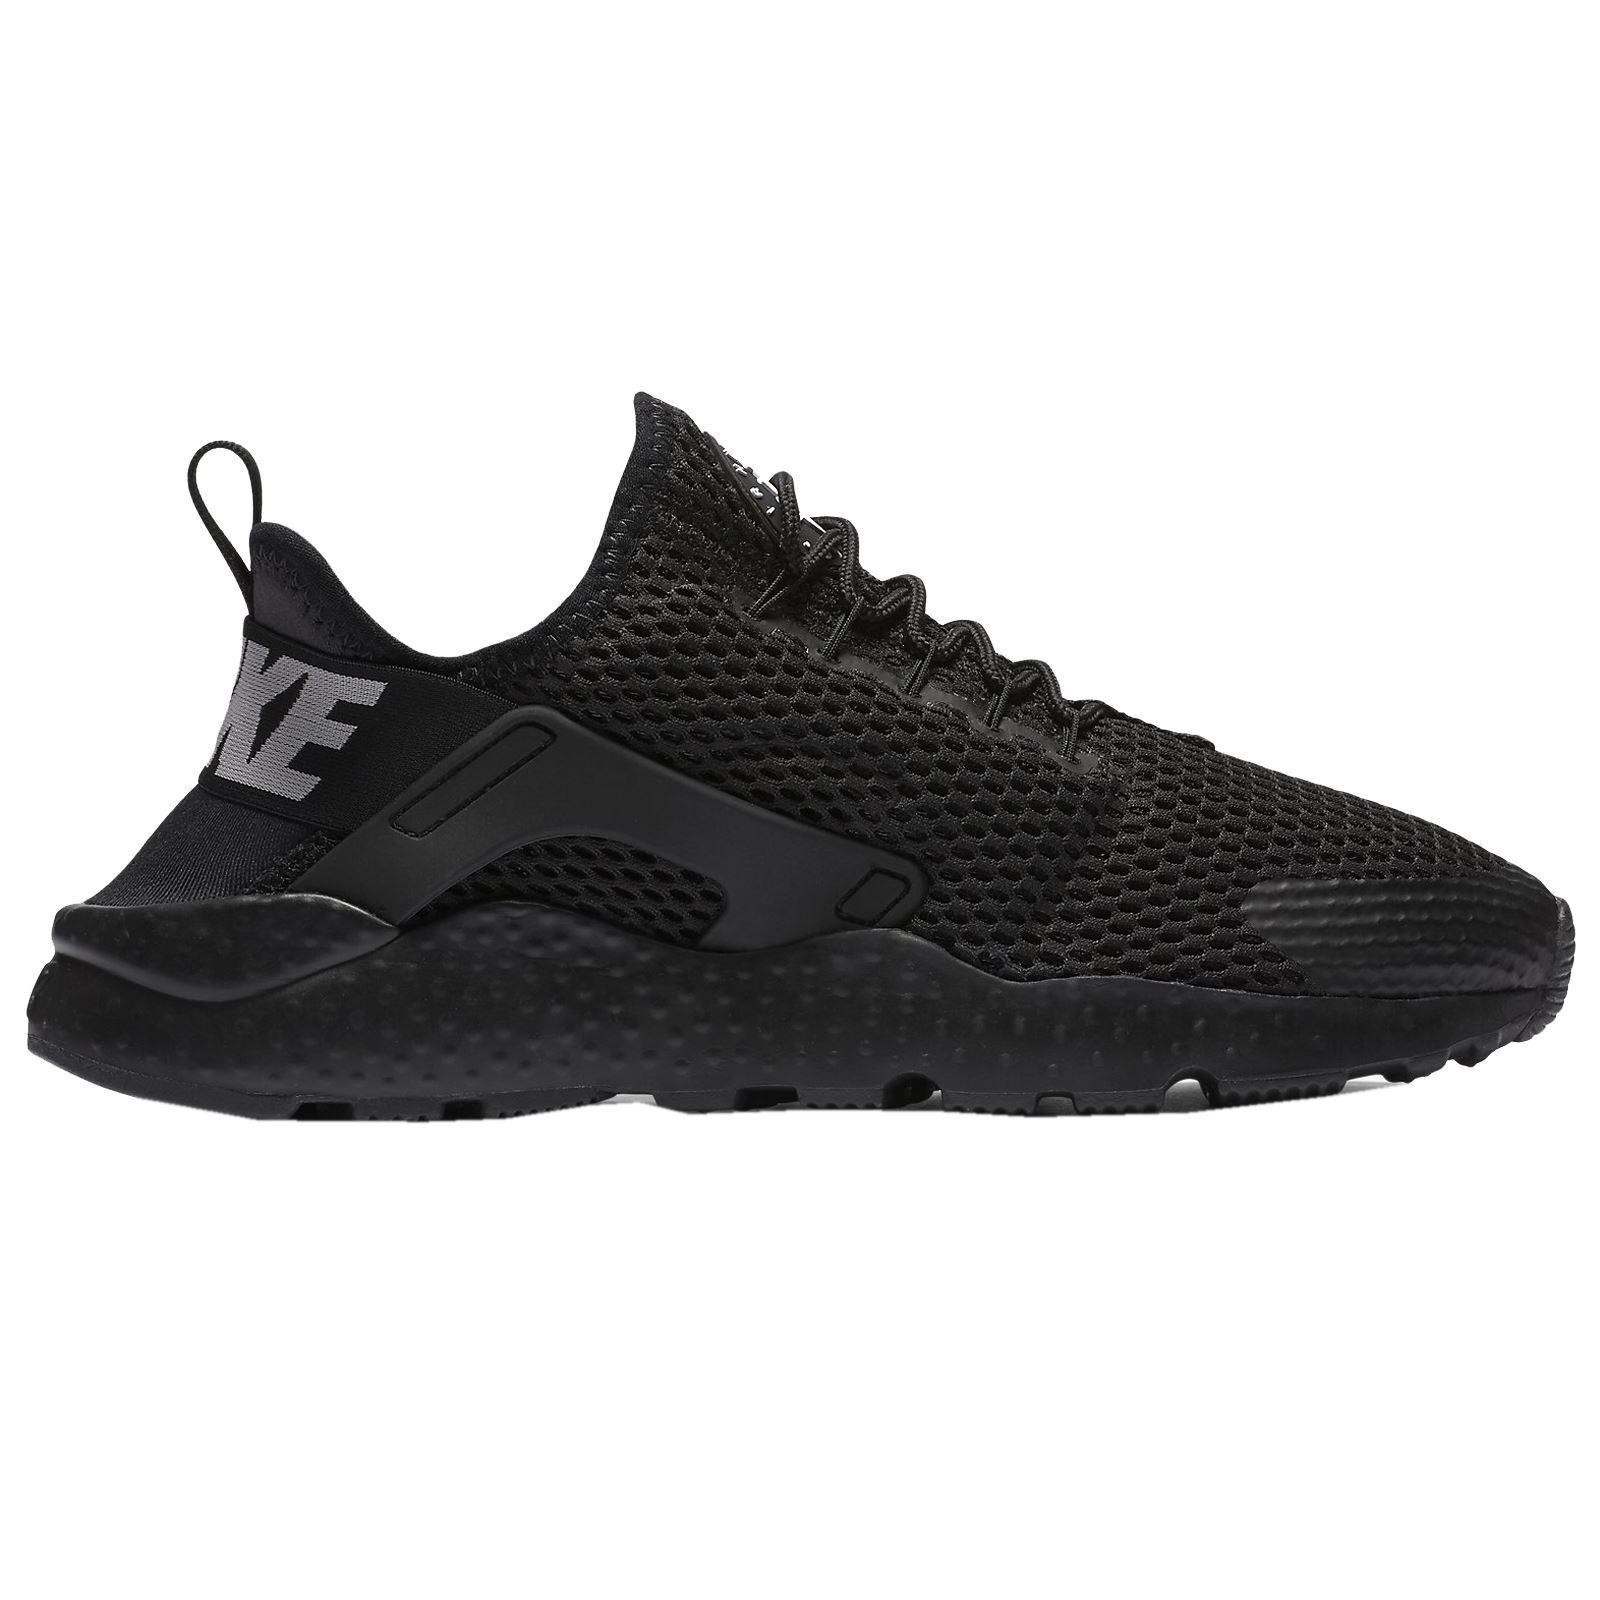 Nike Air huarache Run mujer ultra respirar Negro mujer Run Trainers a402dc